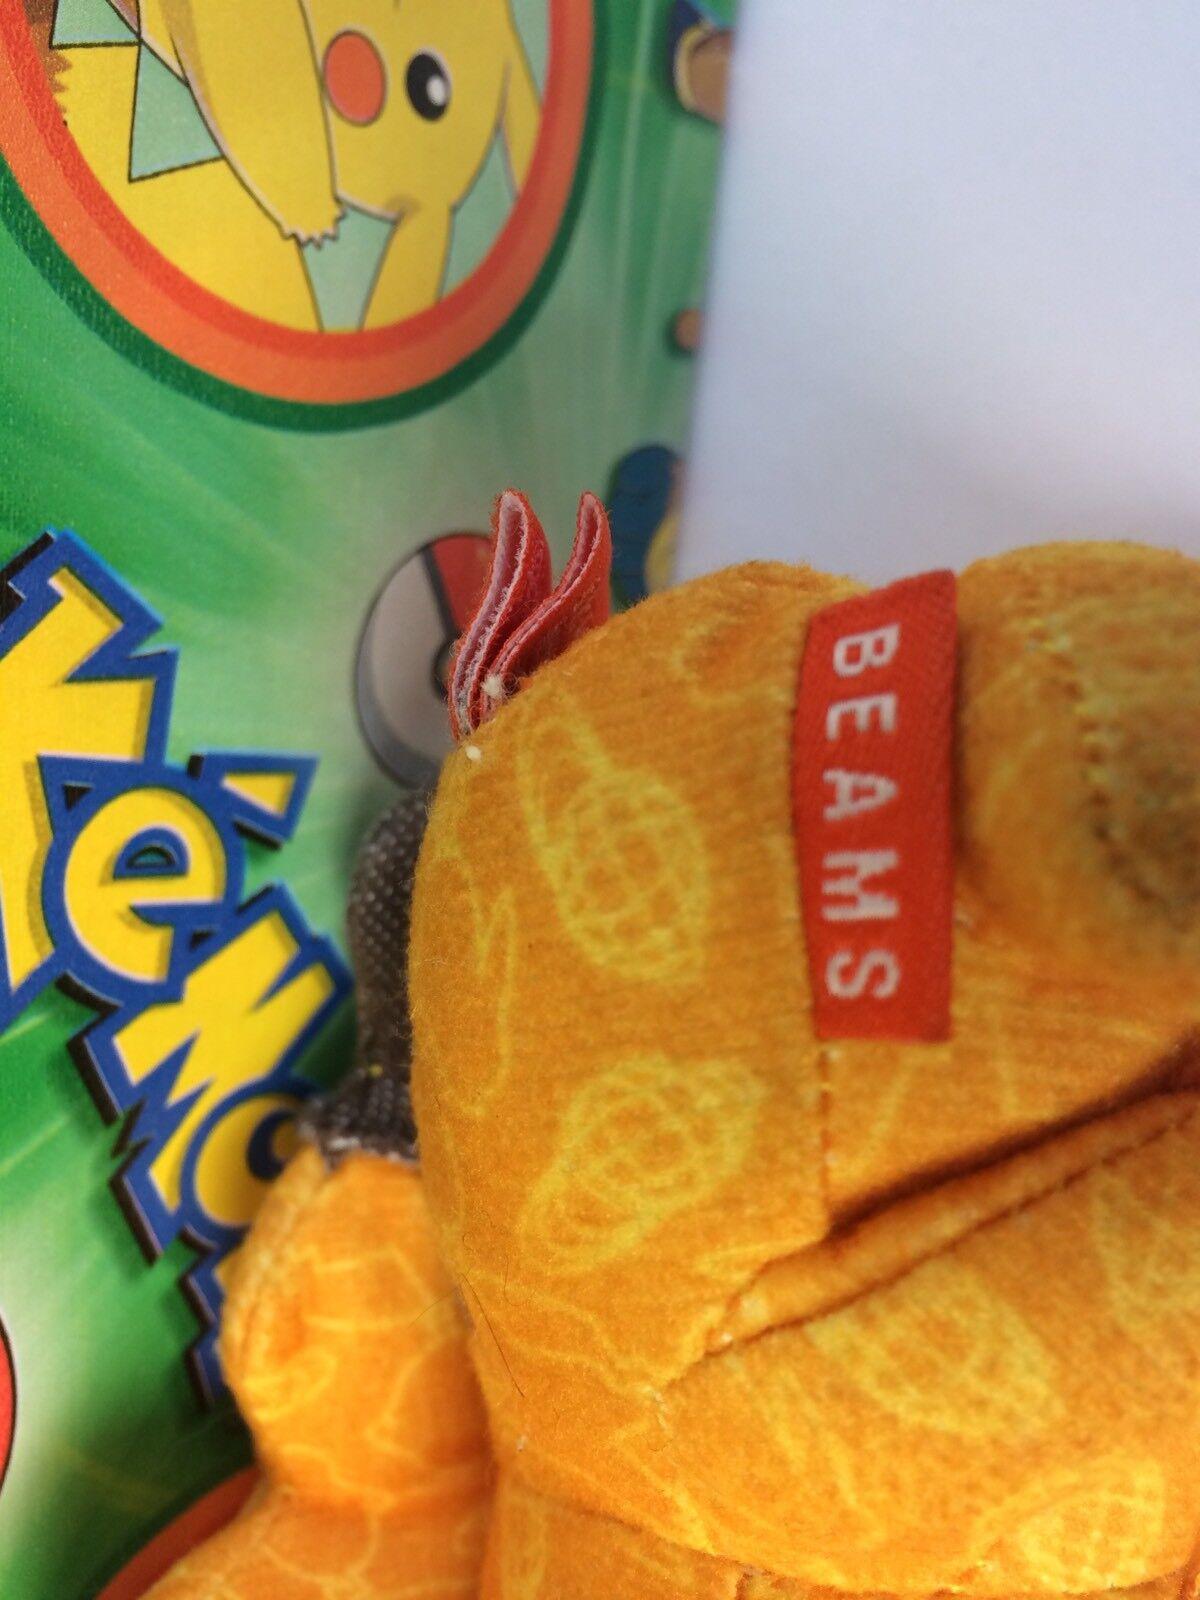 Pokemon Center Pikachu Beams Patchwork Plush 2013 2013 2013 Keychain Doll Stuffed figure 27667a